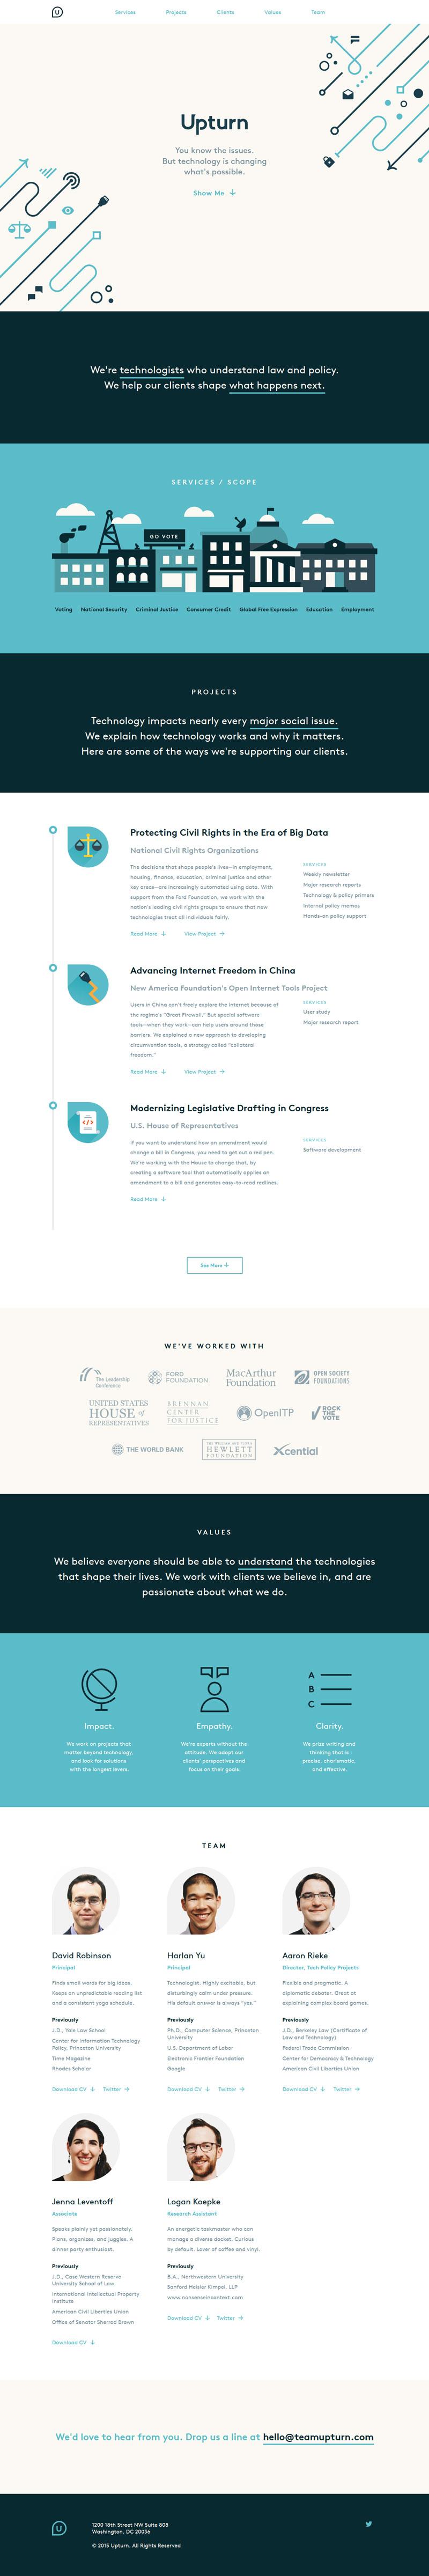 Upturn - Flat Design Website